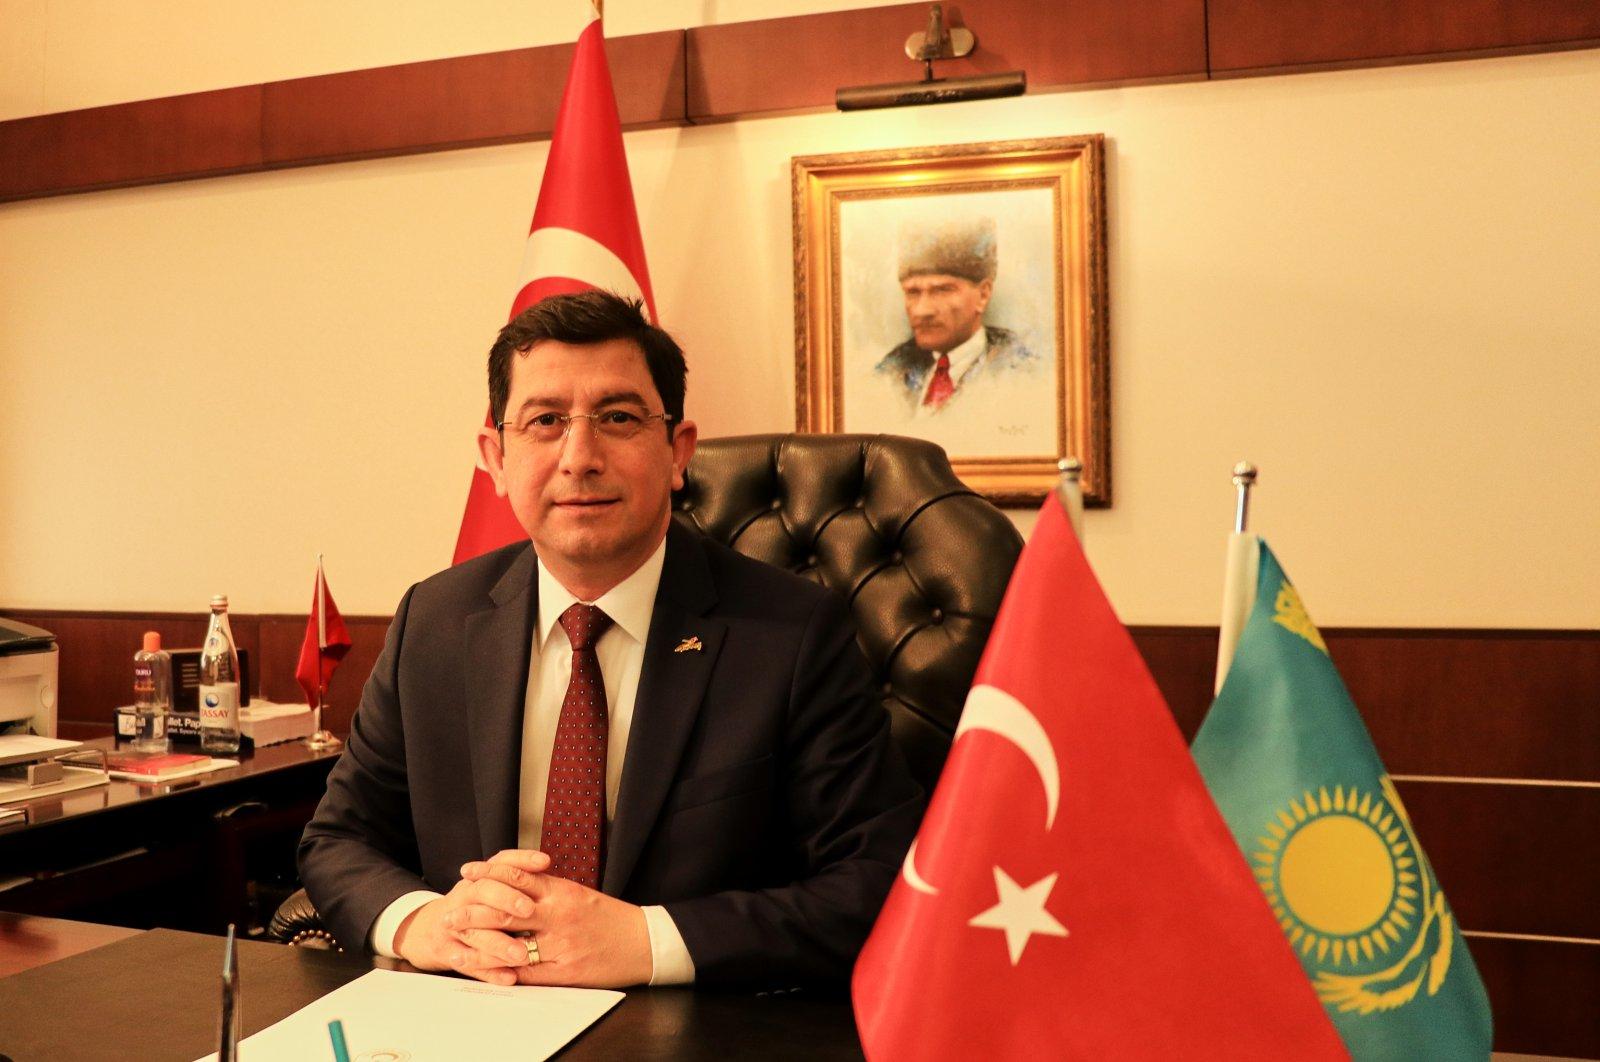 Turkey, Kazakhstan commemorate 29th anniversary of ties